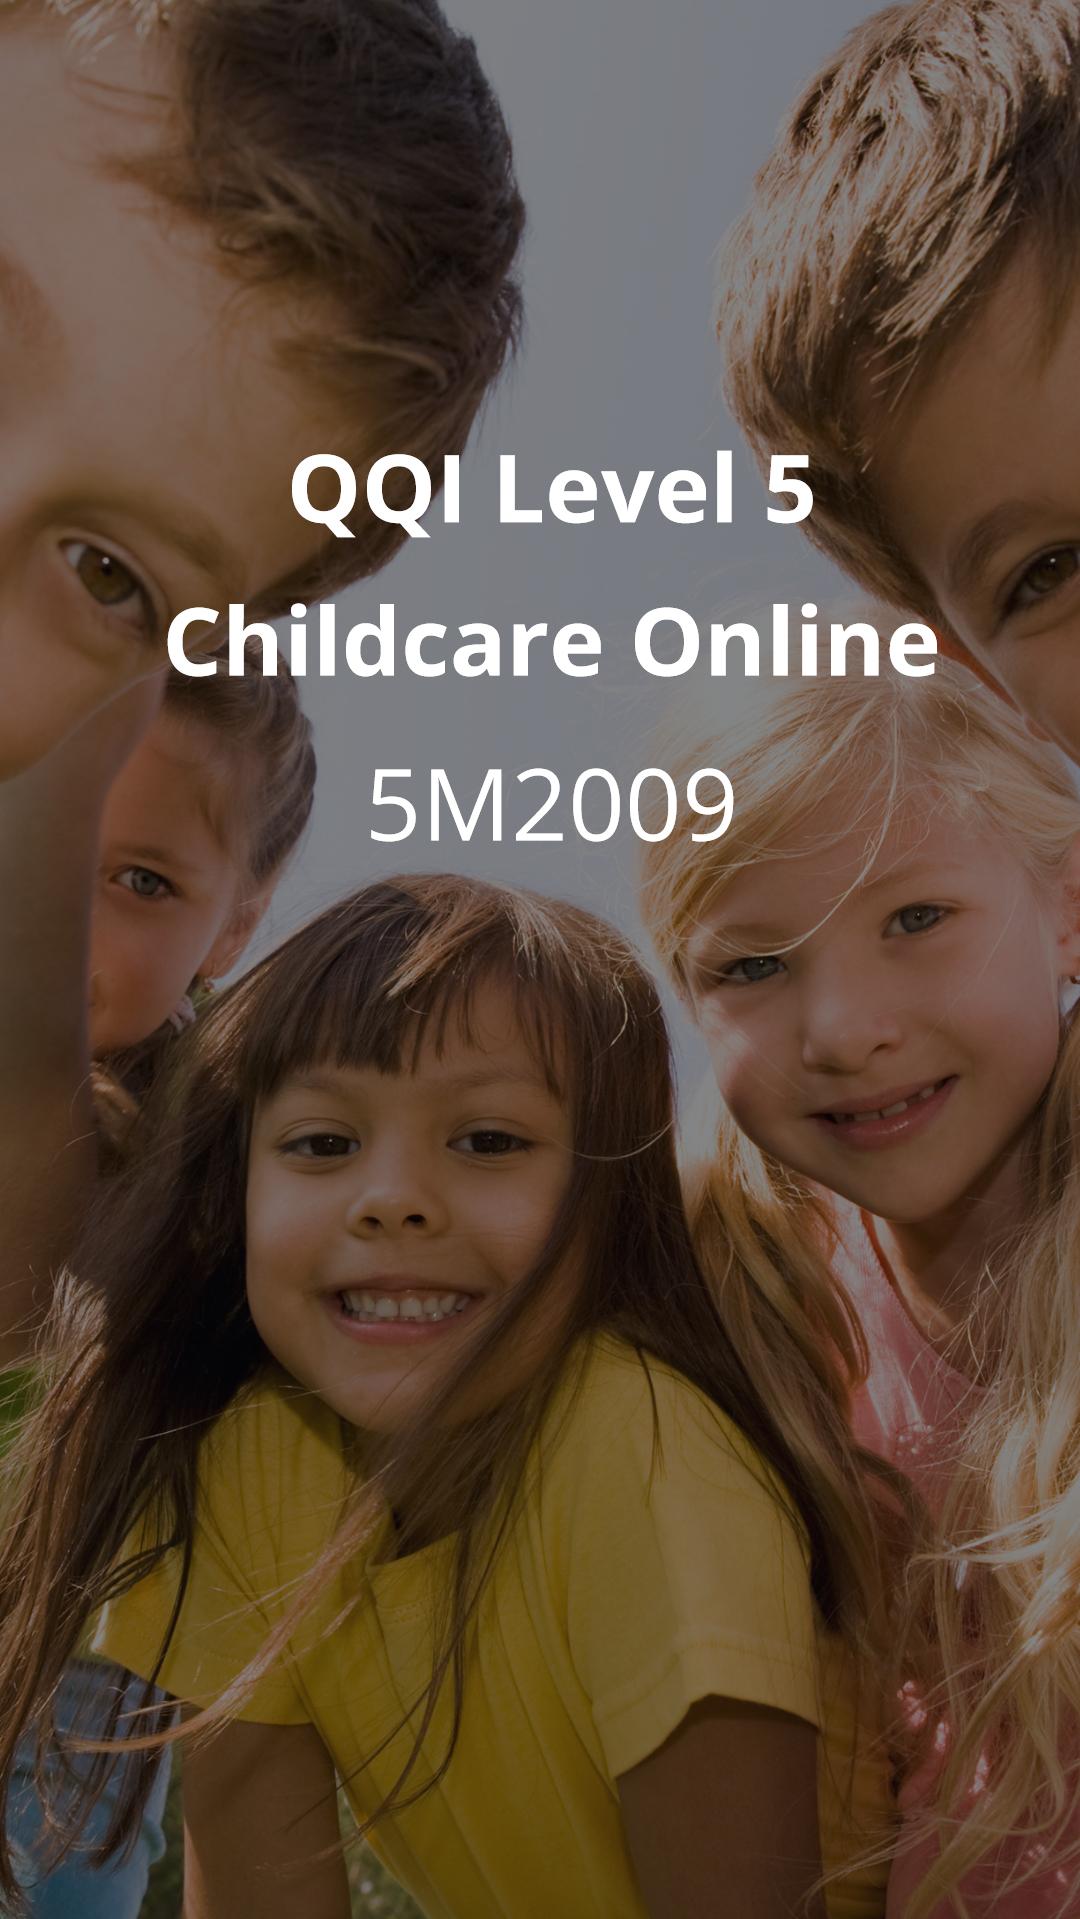 level 5 childcare